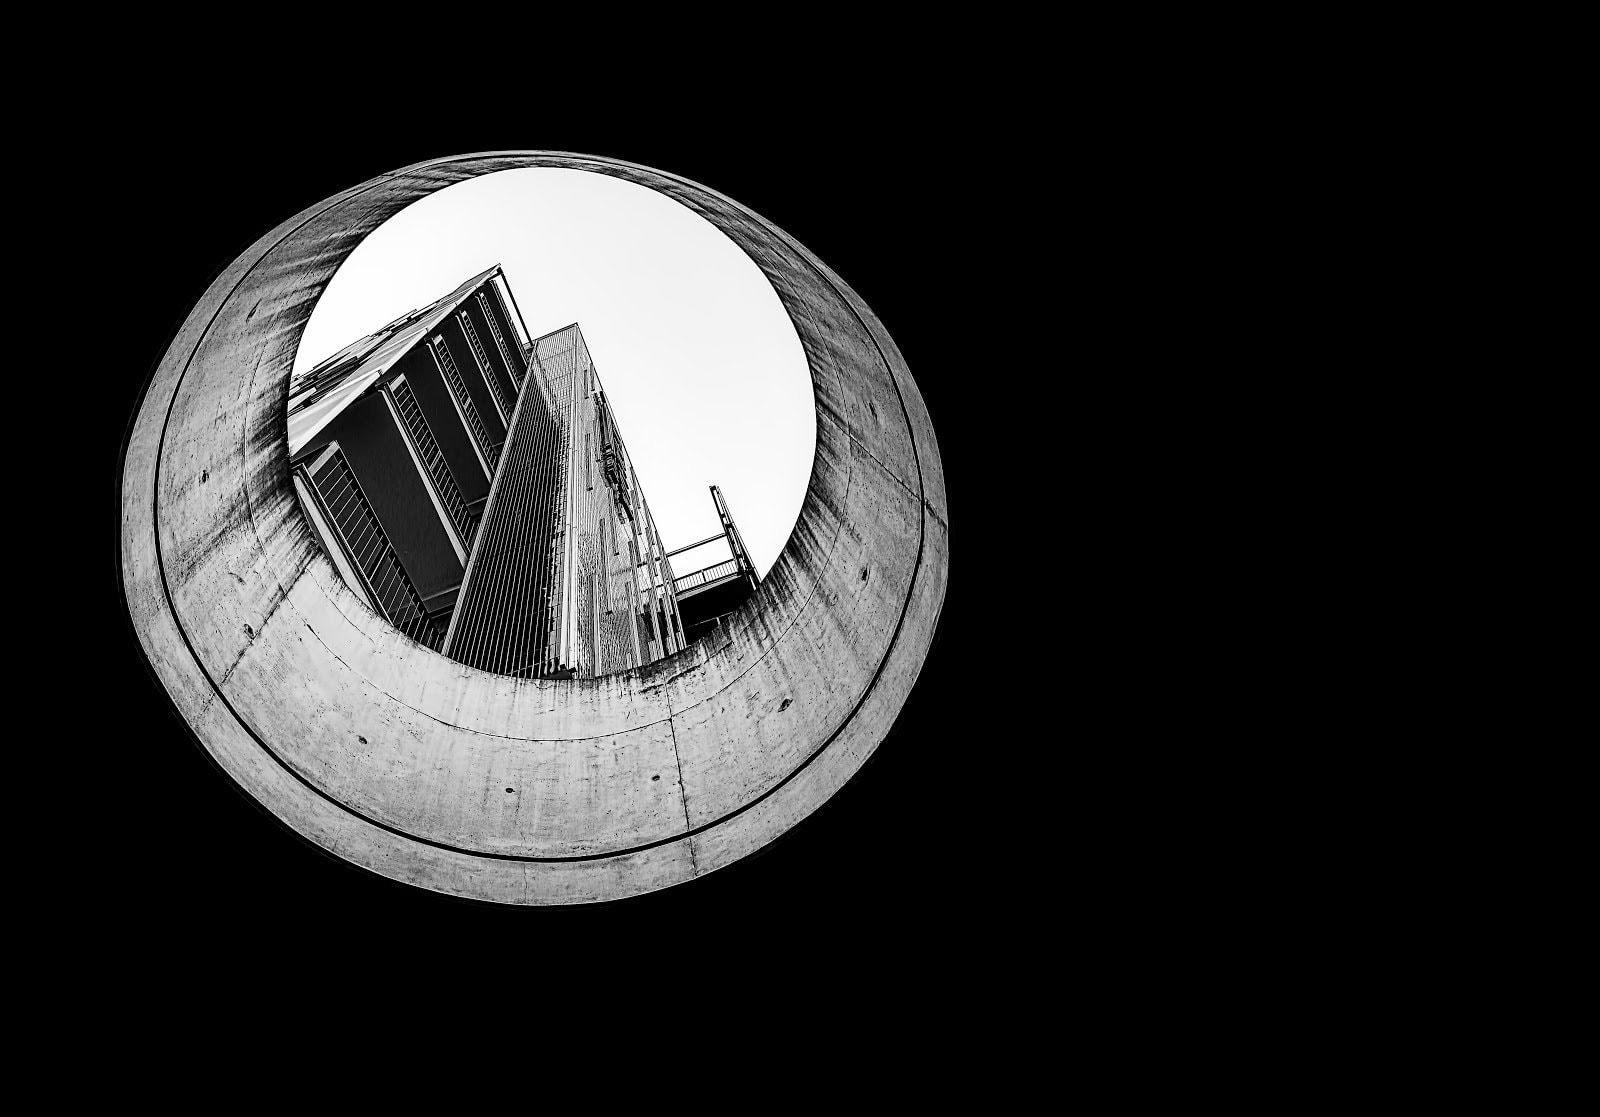 Monochrome photo of a building seen through a hole by Ricardo Gomez Angel